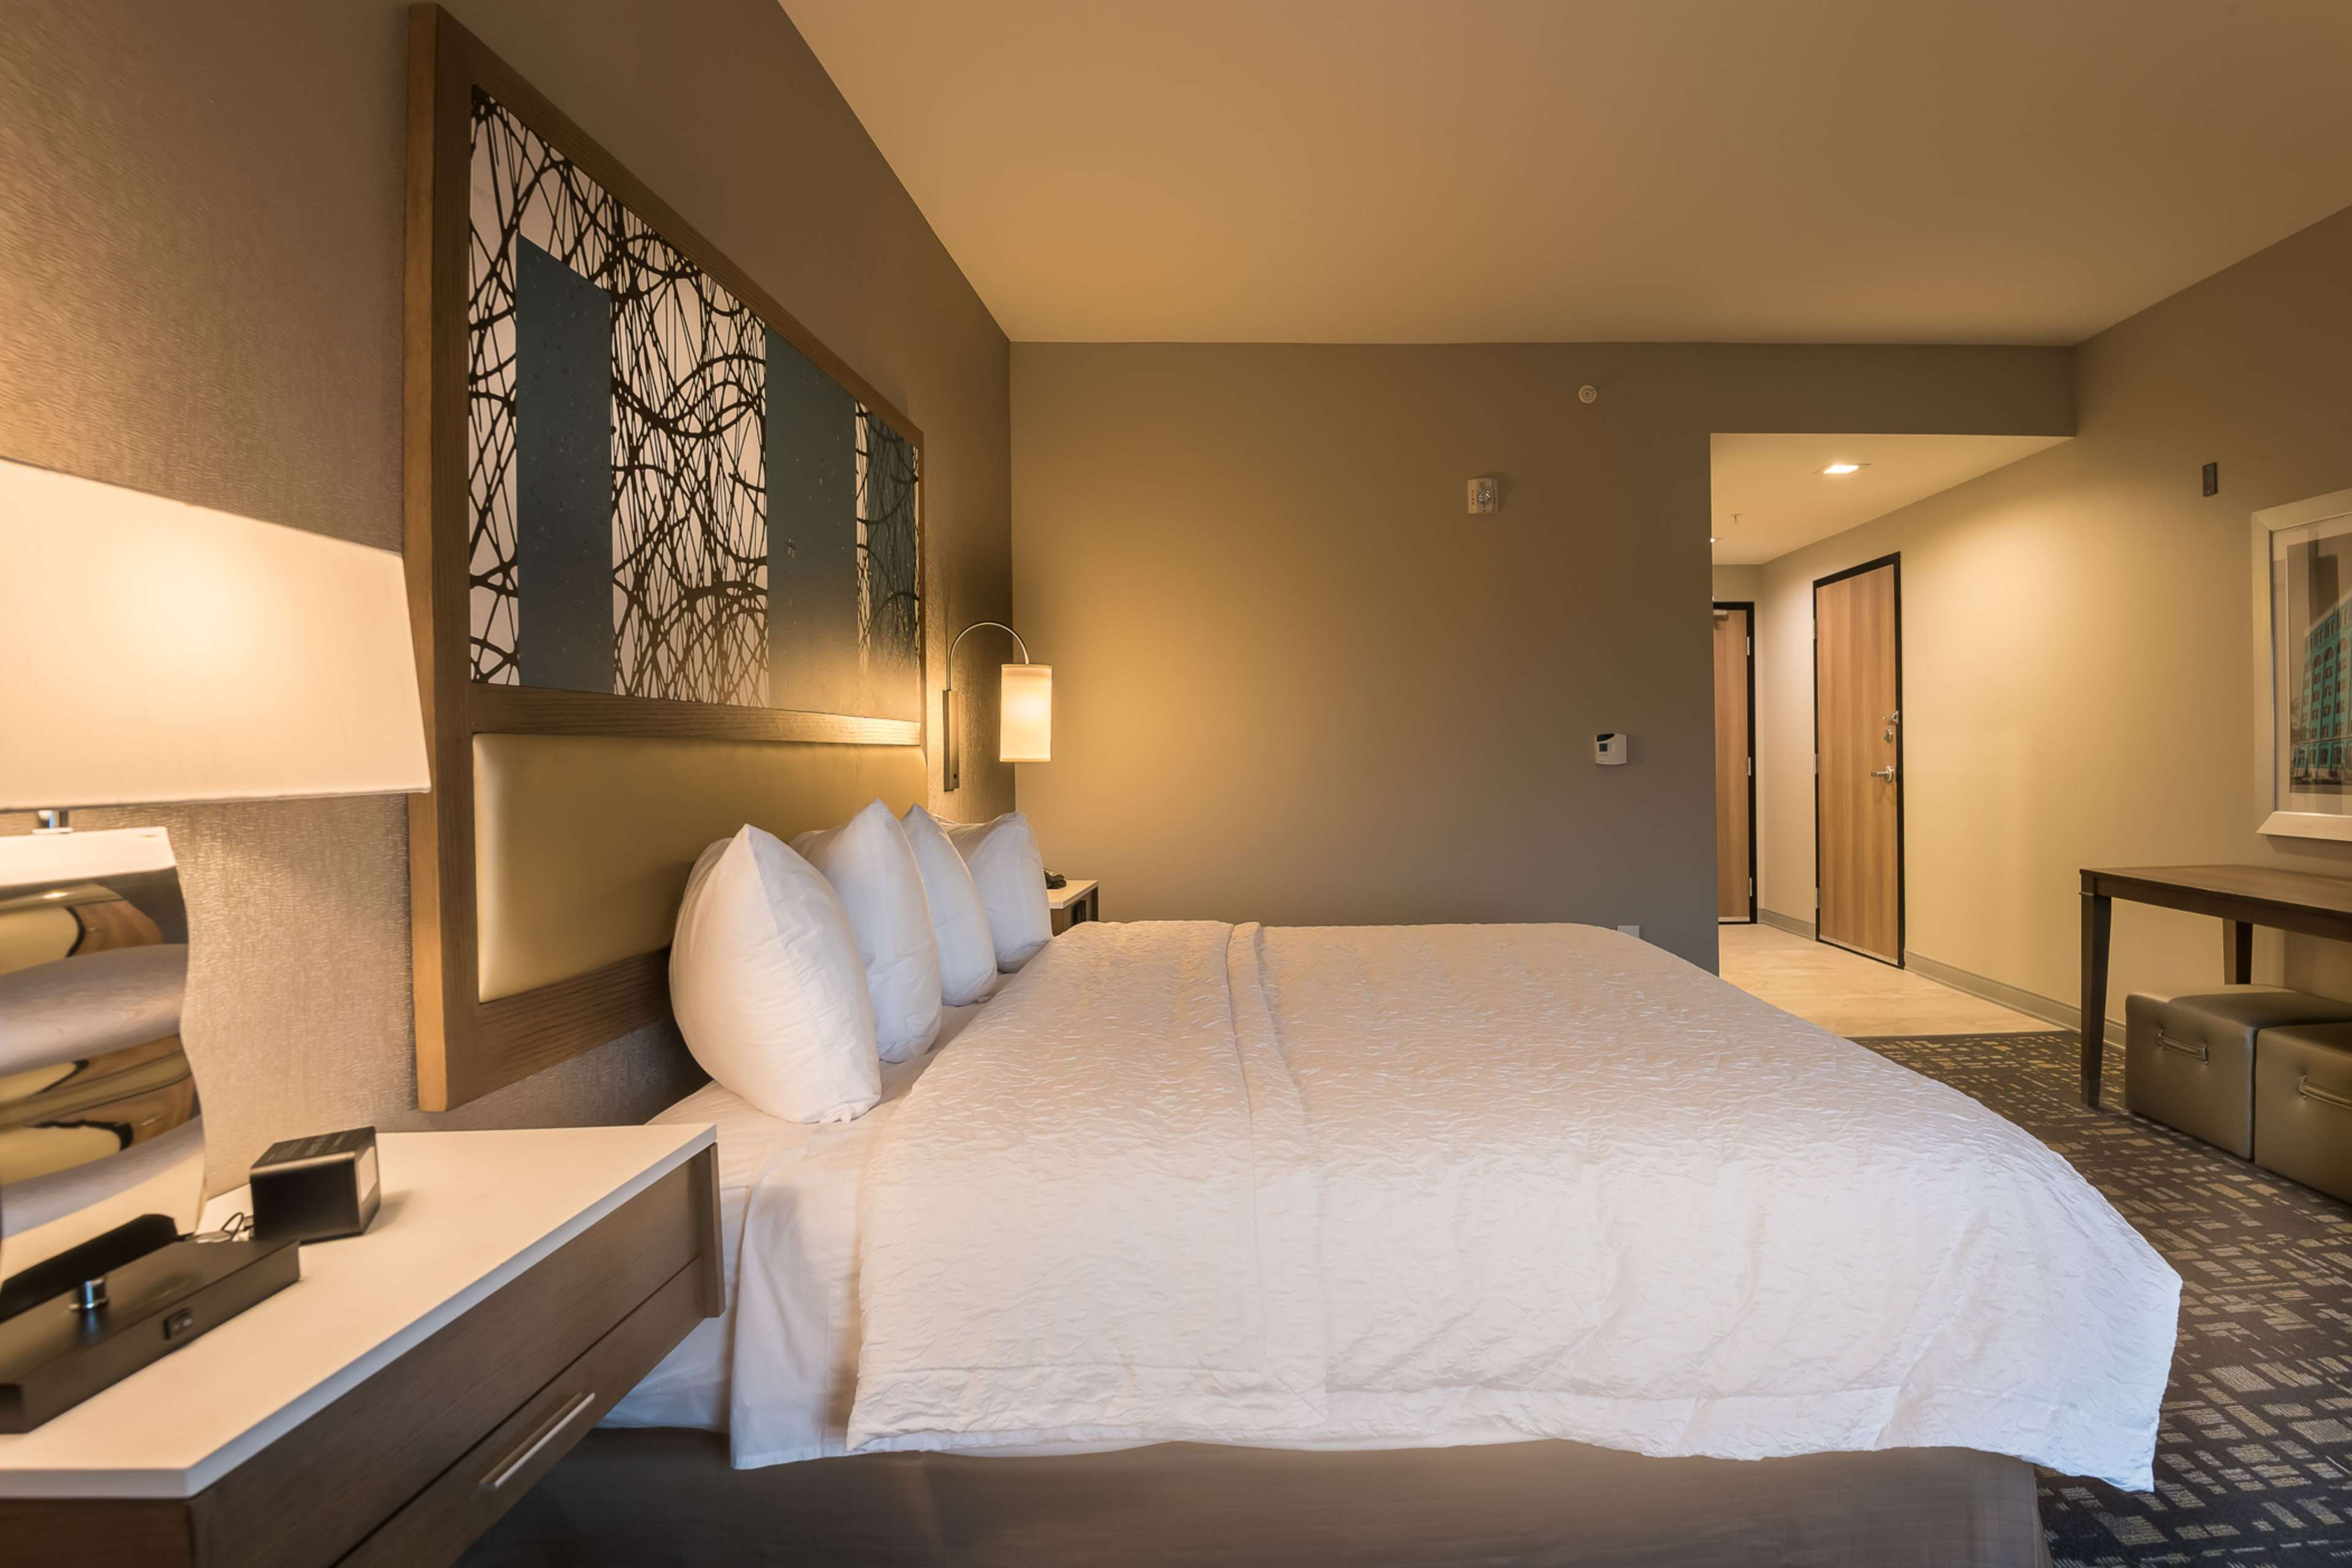 Hampton Inn & Suites Dallas-The Colony, TX image 24